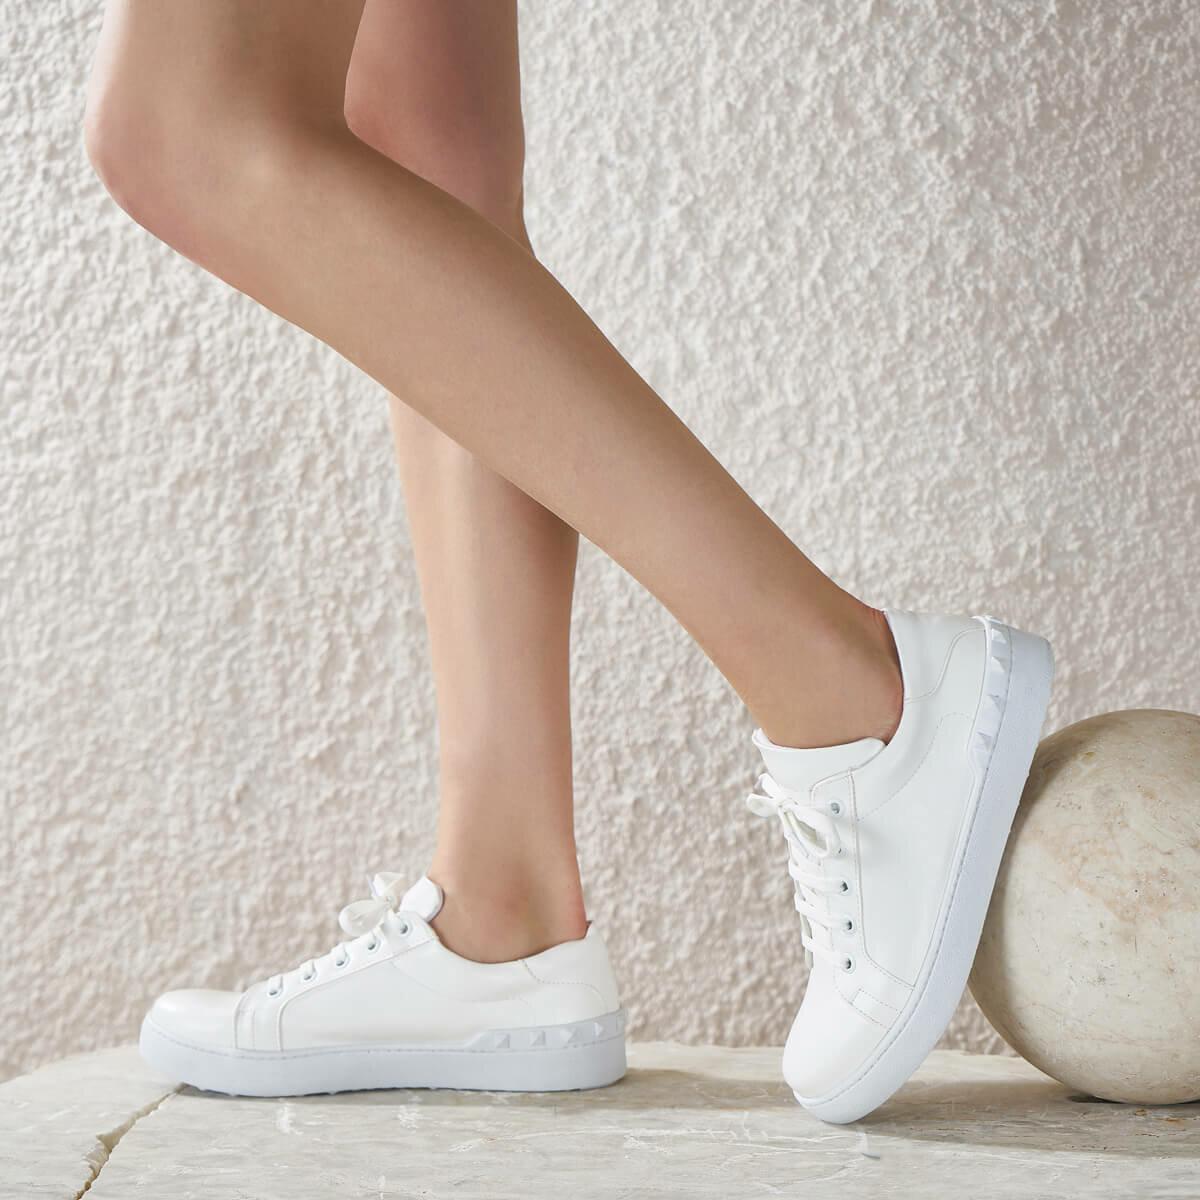 FLO BETA01Z White Women 'S Sneaker Shoes BUTIGO